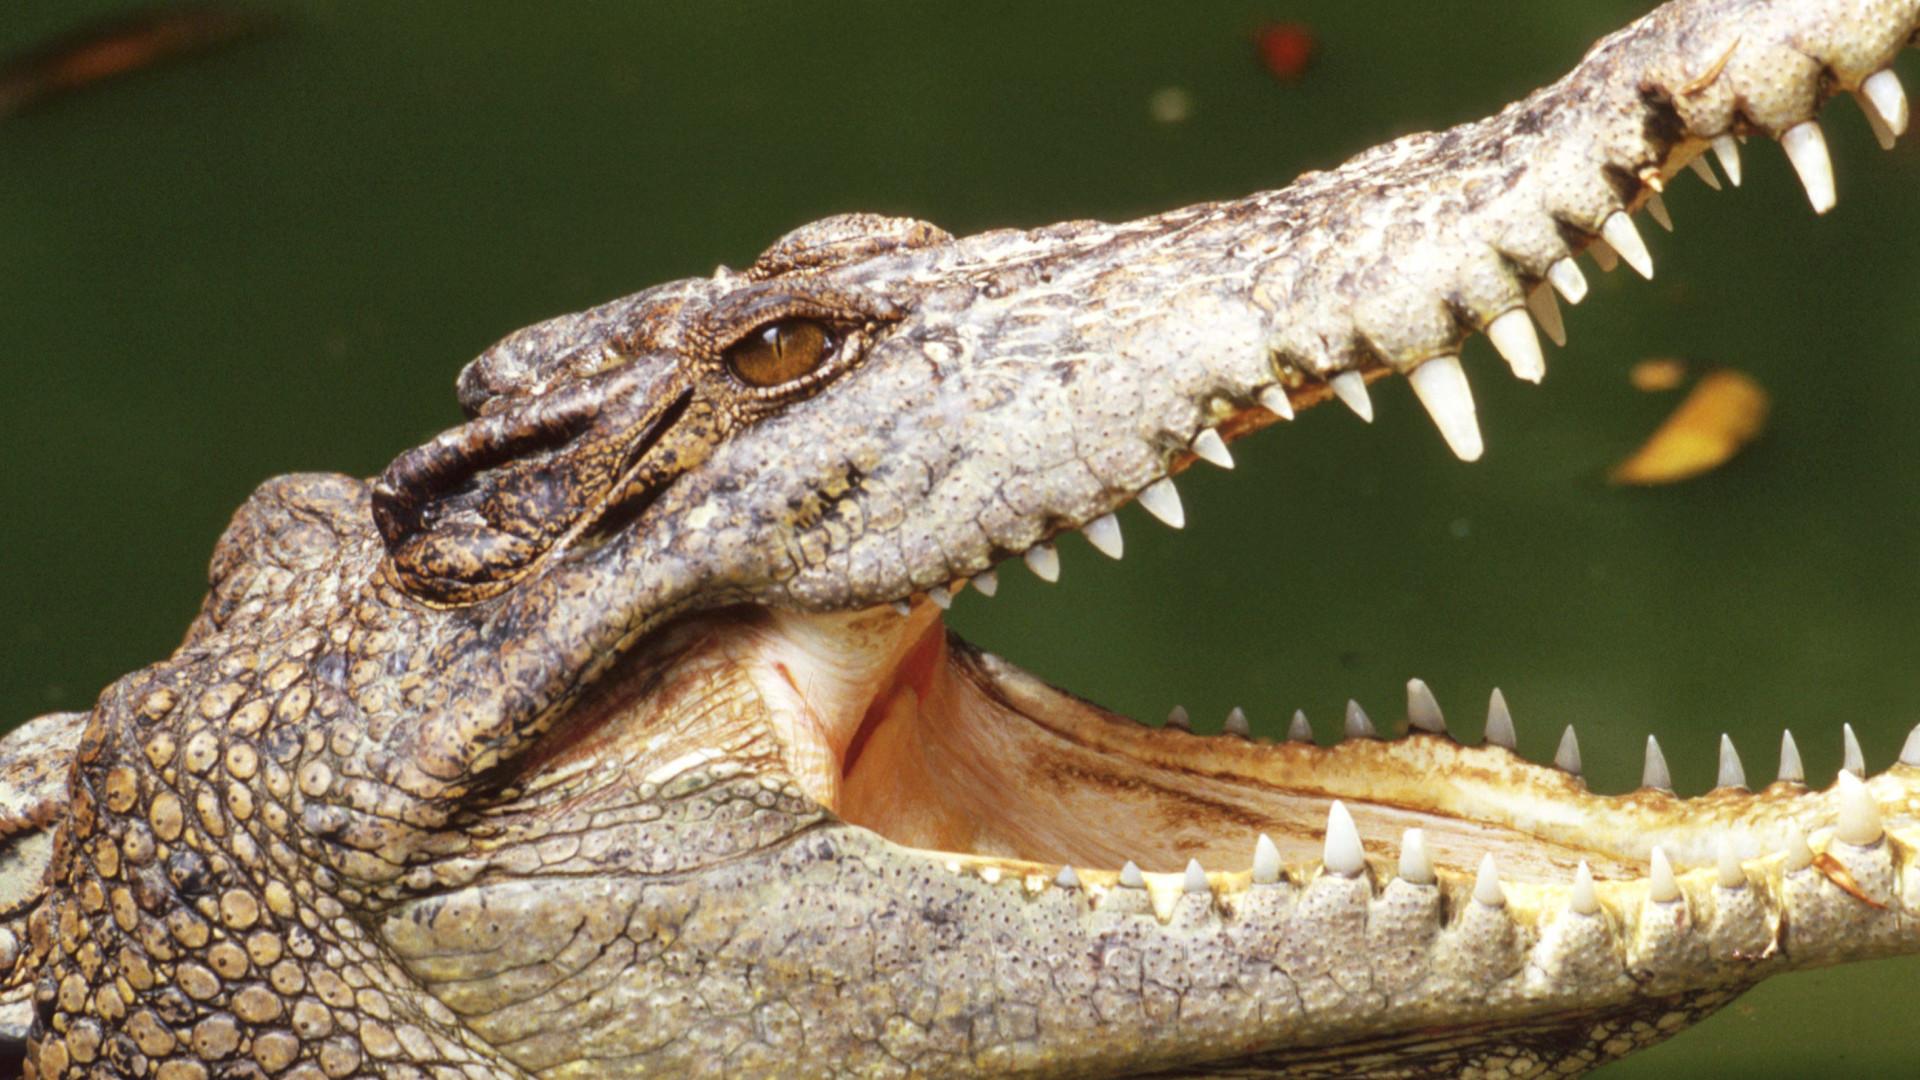 American crocodile run over, killed in the Florida Keys - Sun Sentinel